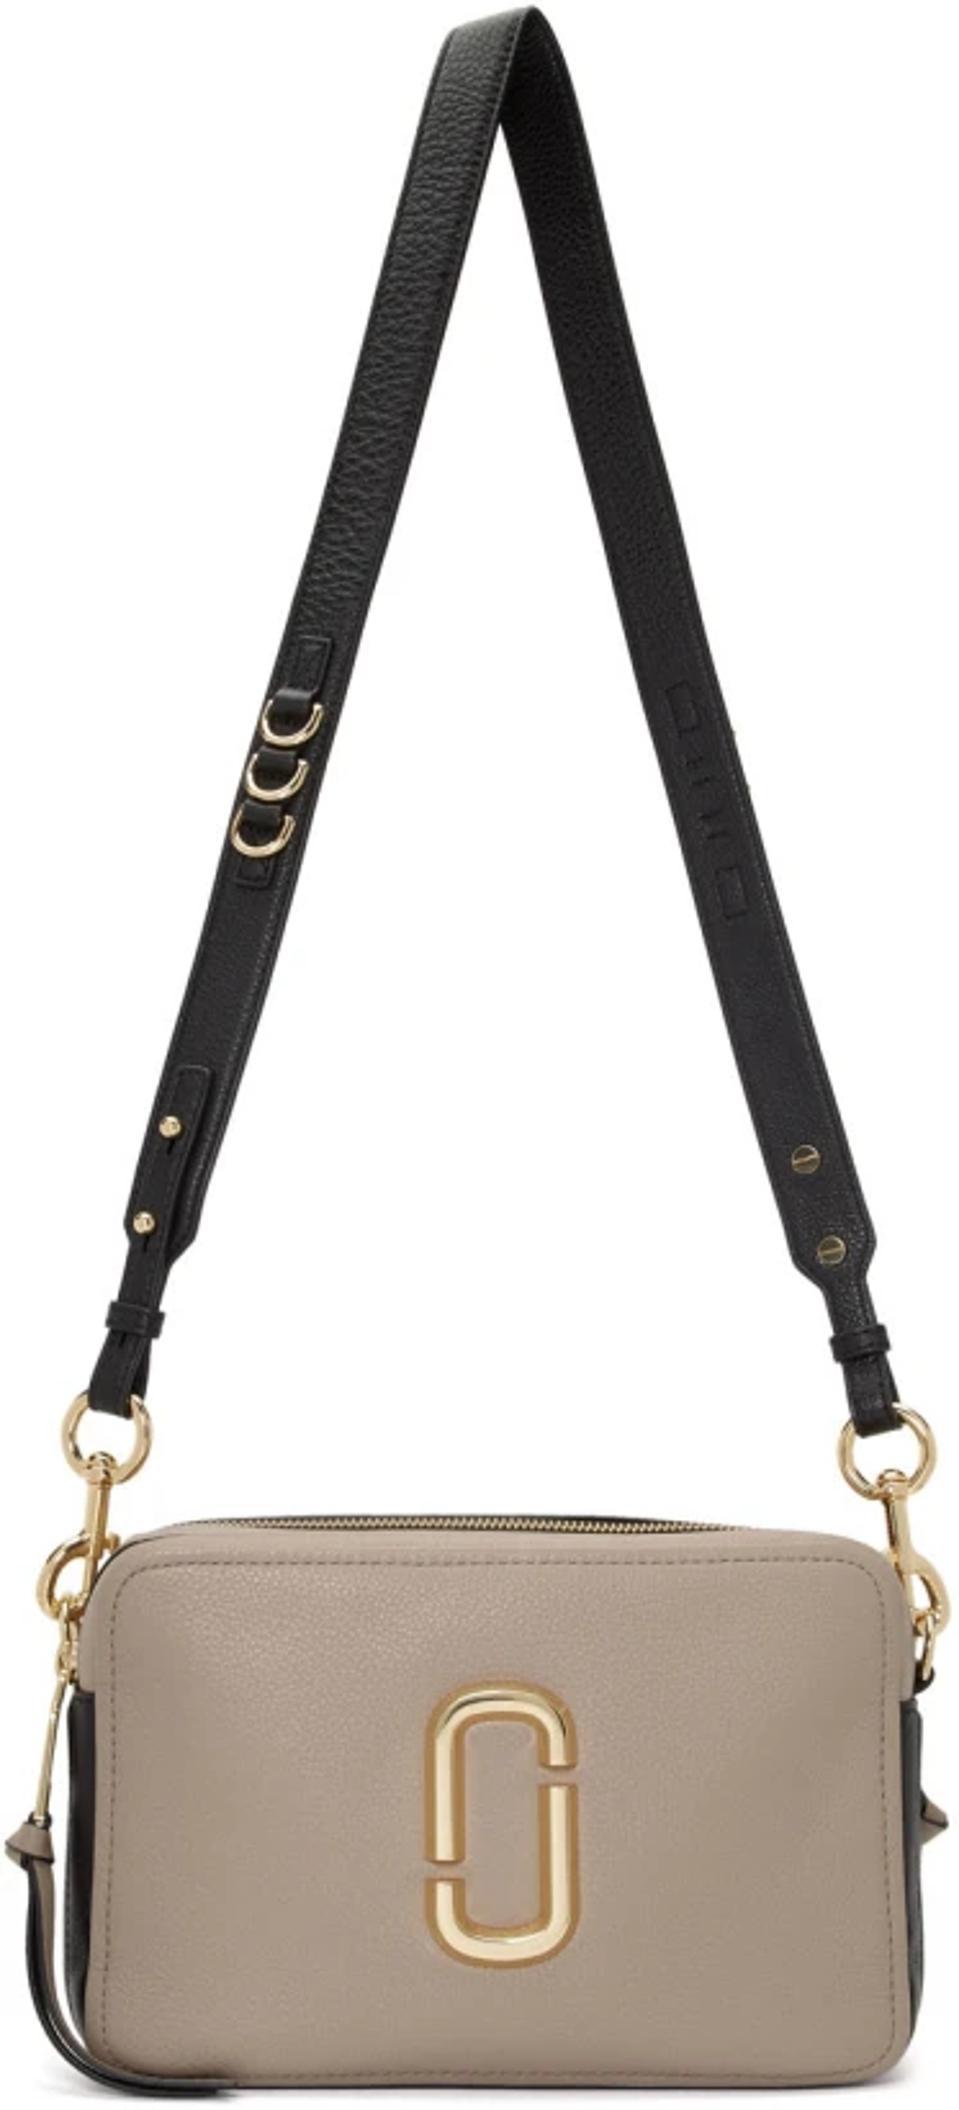 Marc Jacobs Grey & Black 'The Softshot' 27 Bag